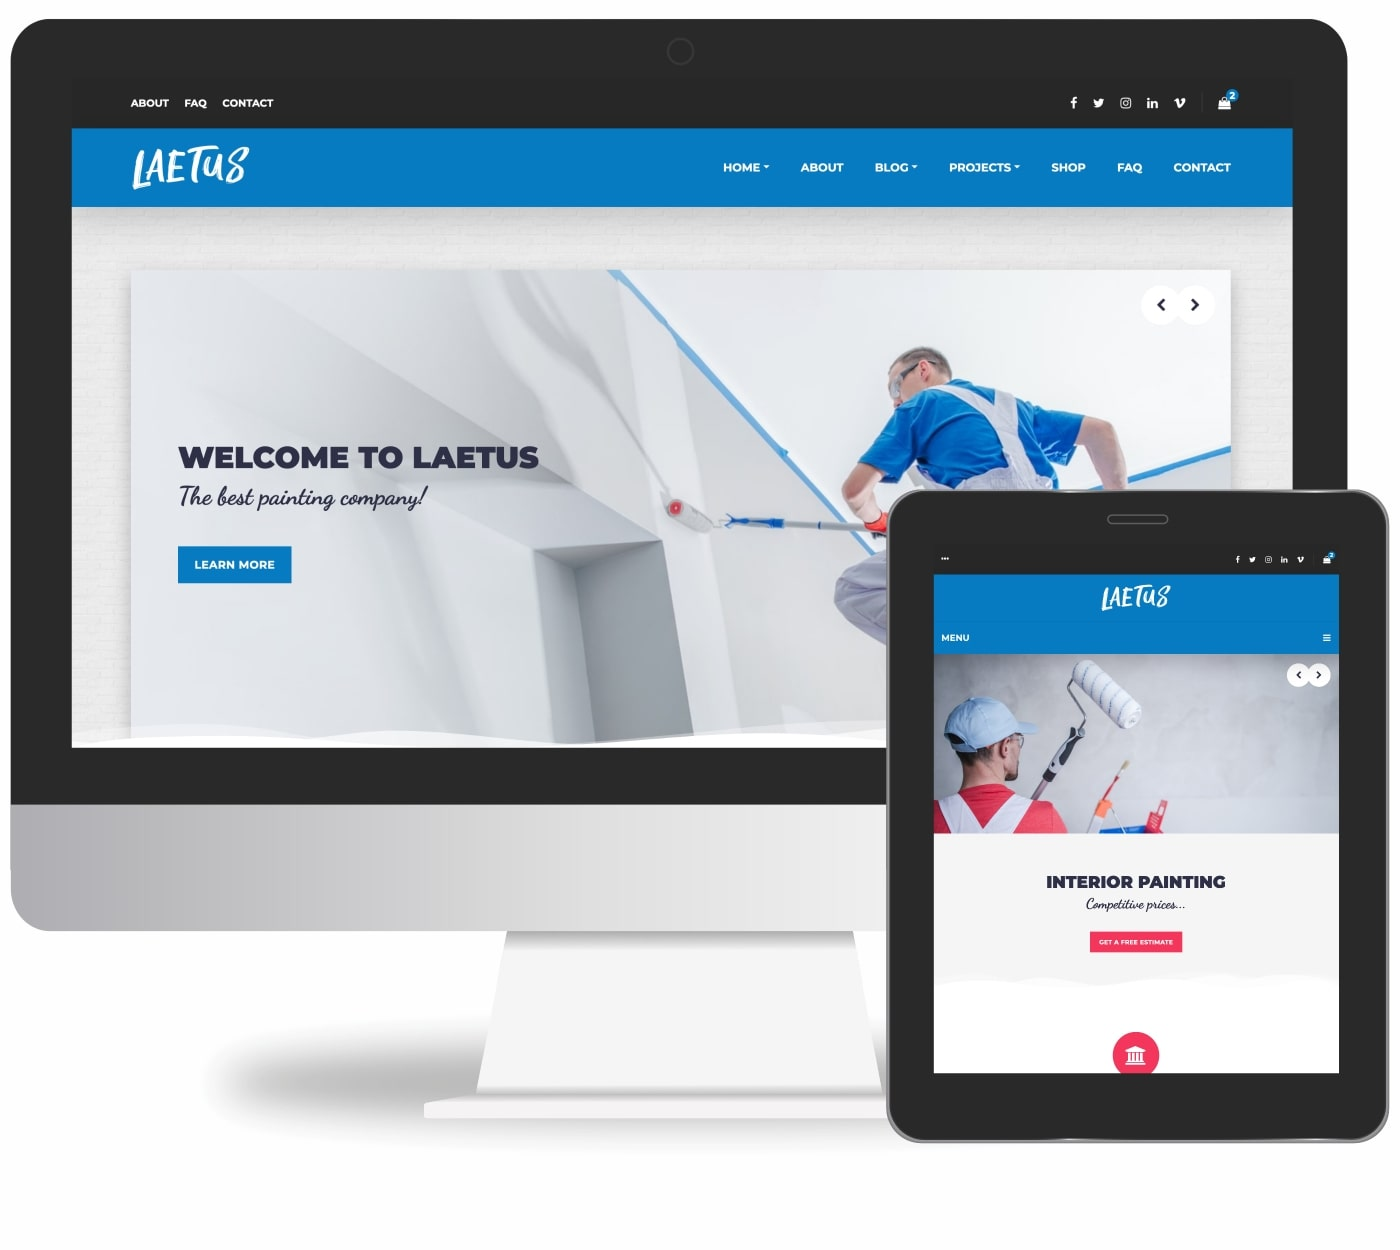 Laetus - Painting Company WordPress Theme